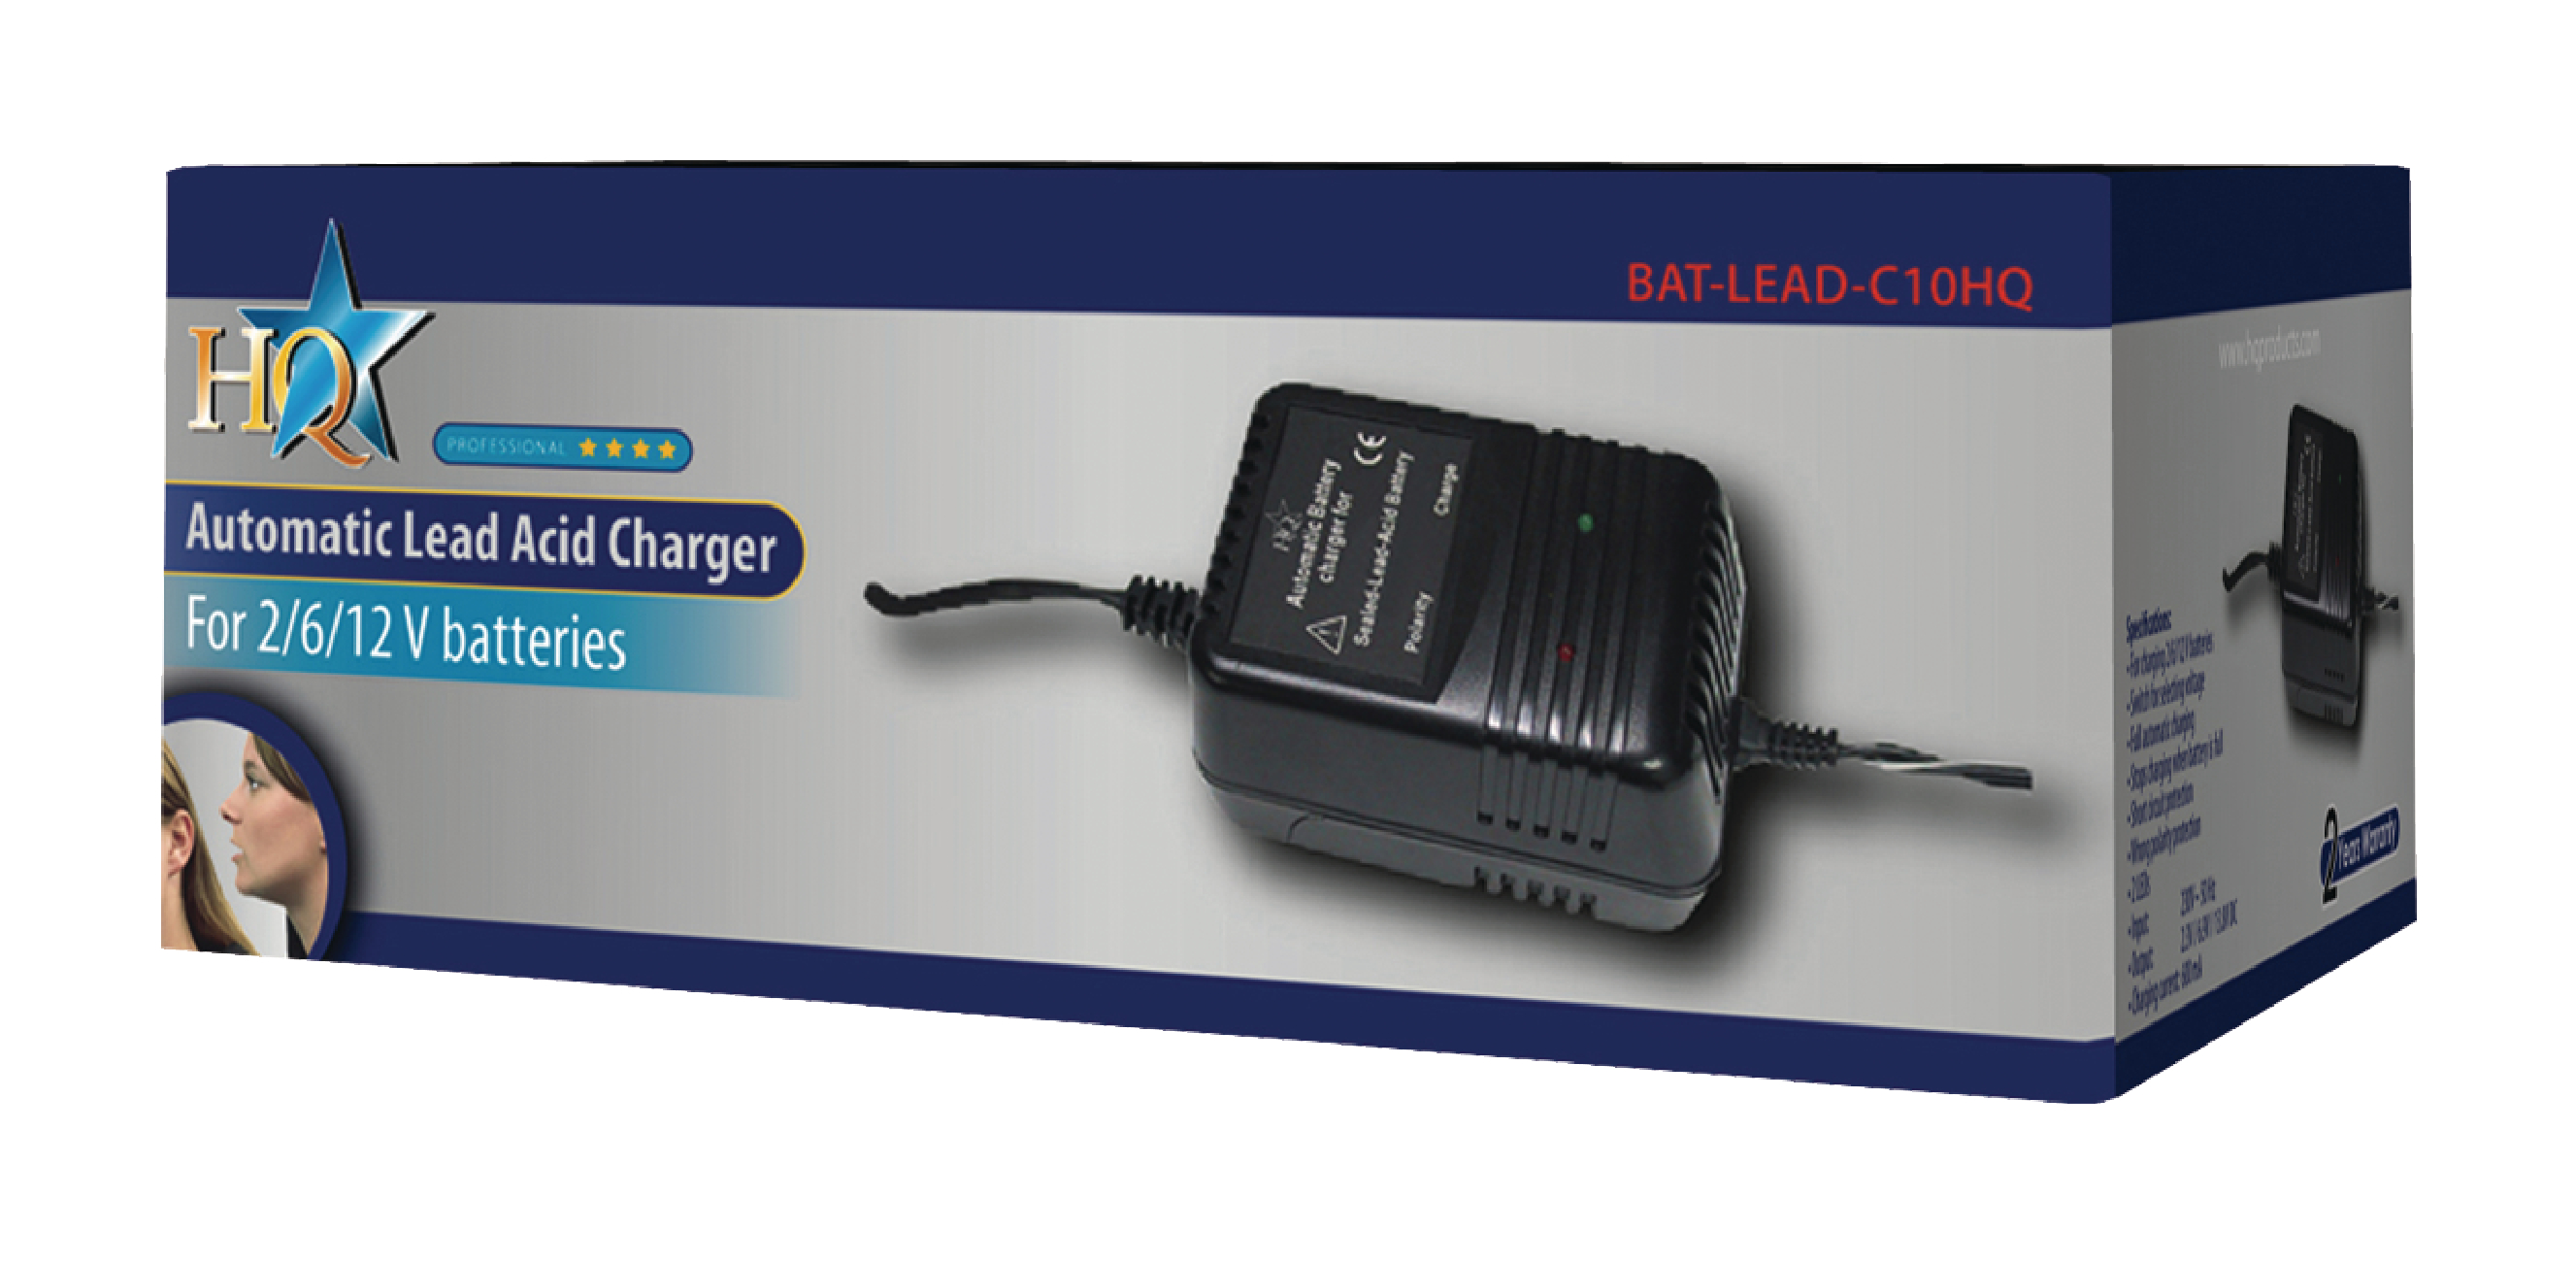 Bat Lead C10hq Hq Acid Battery Charger 2 Vdc 6 12 12v Automatic Circuit Electronic